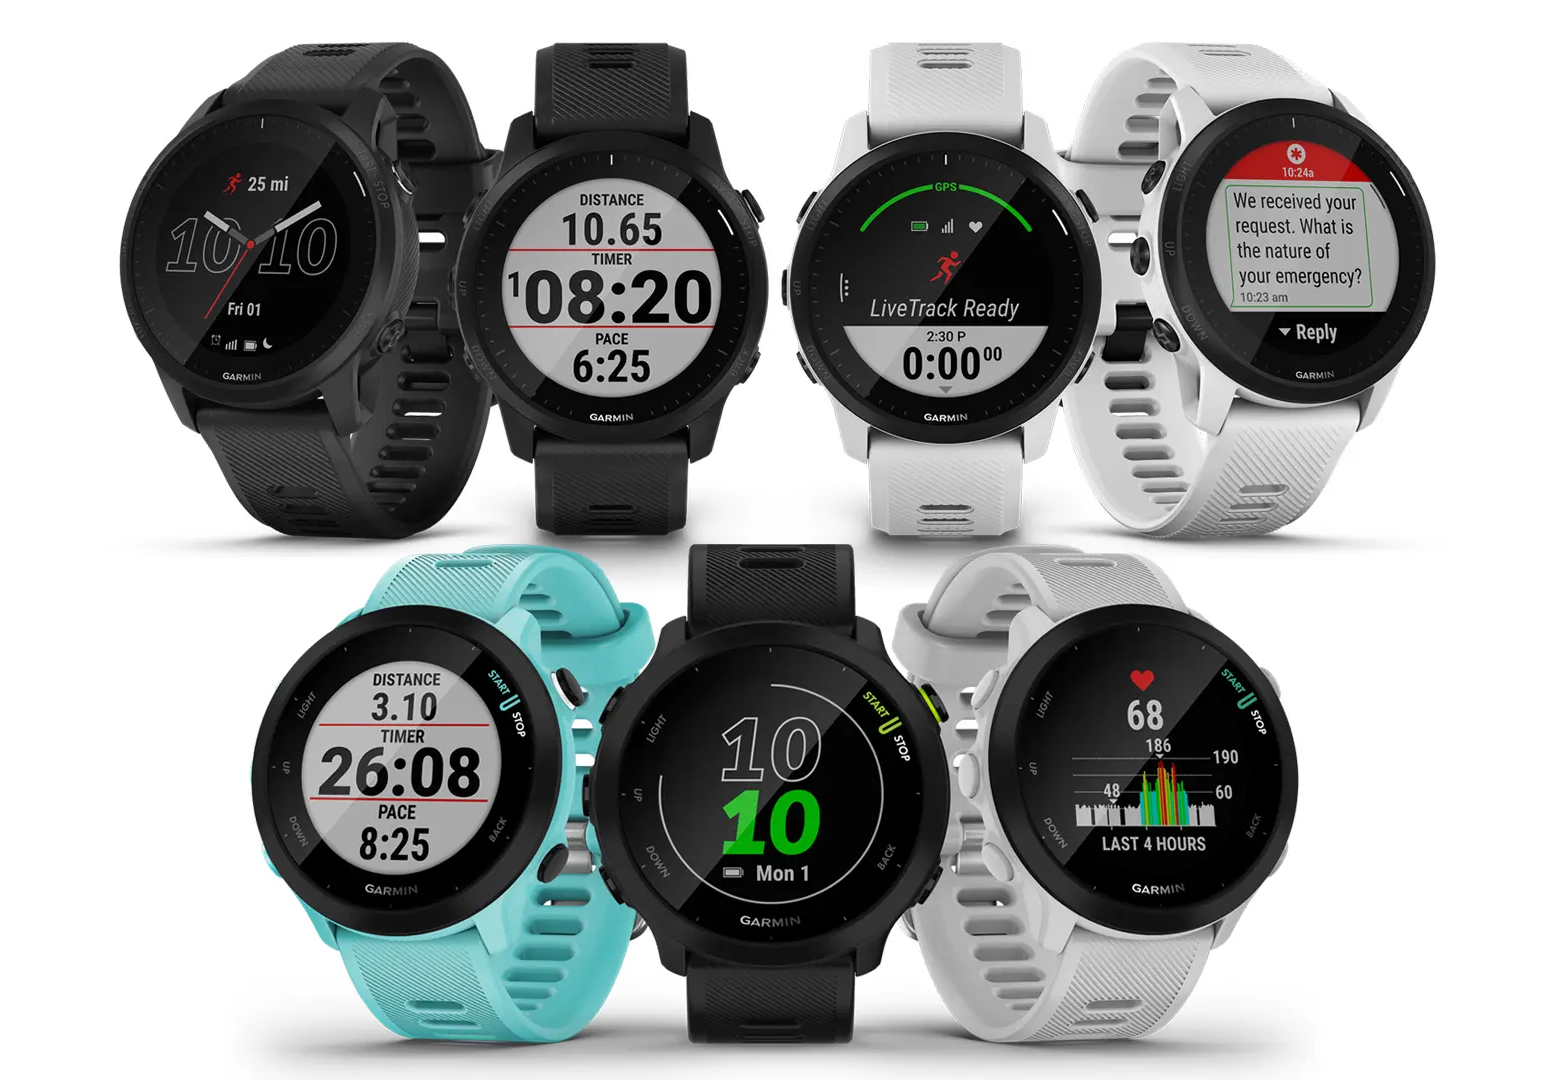 Garmin Forerunner 55 and new 945 LTE watch